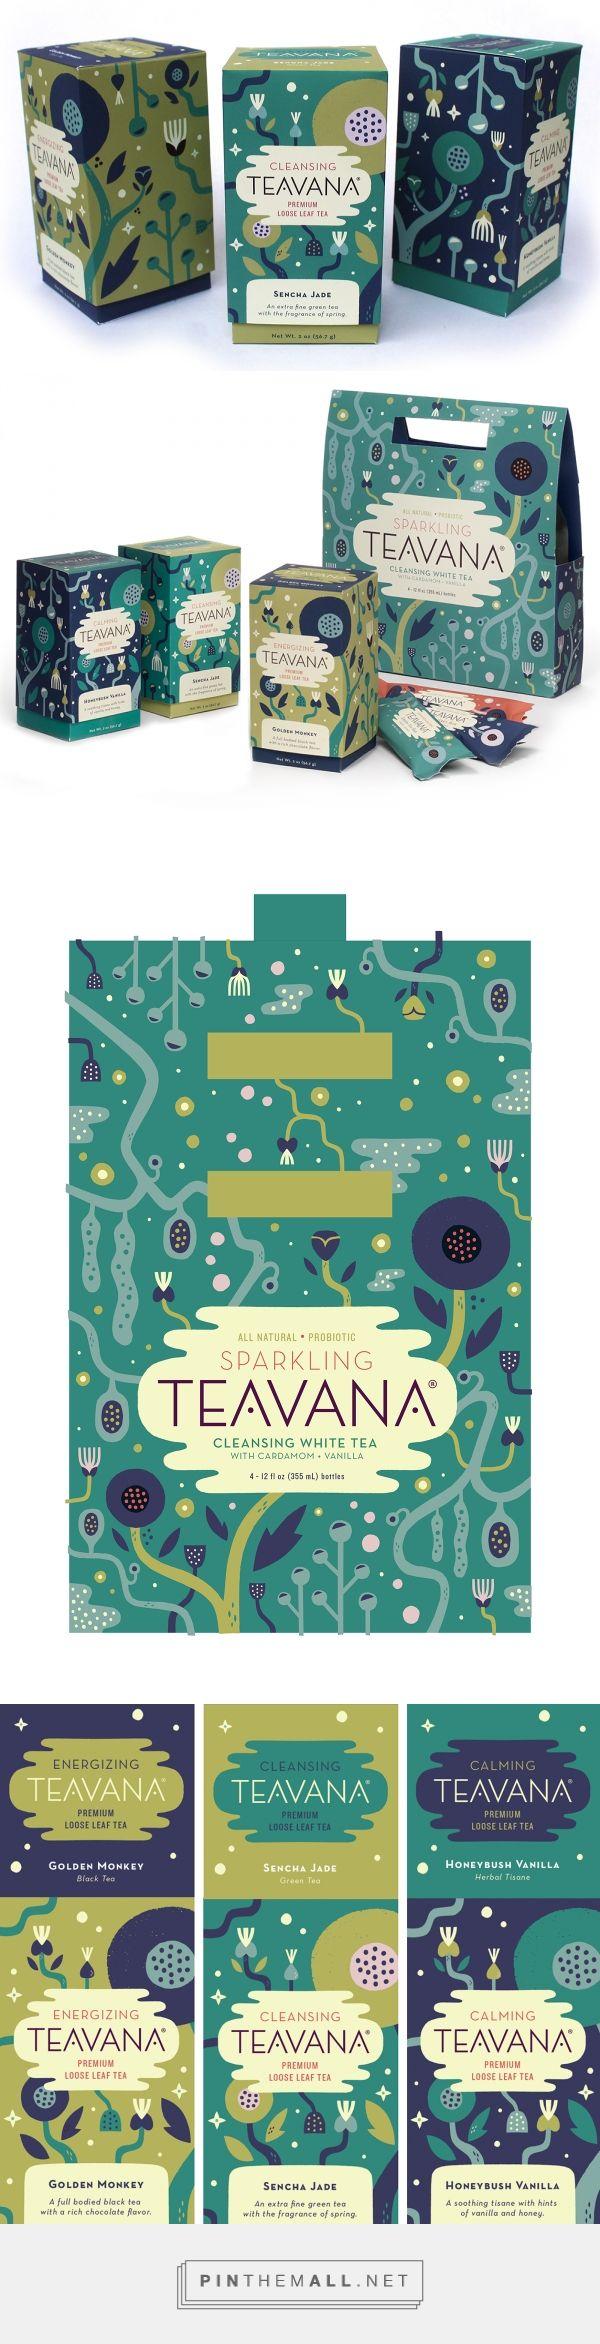 Teavana Tea Rebrand  by Alexander Vidal